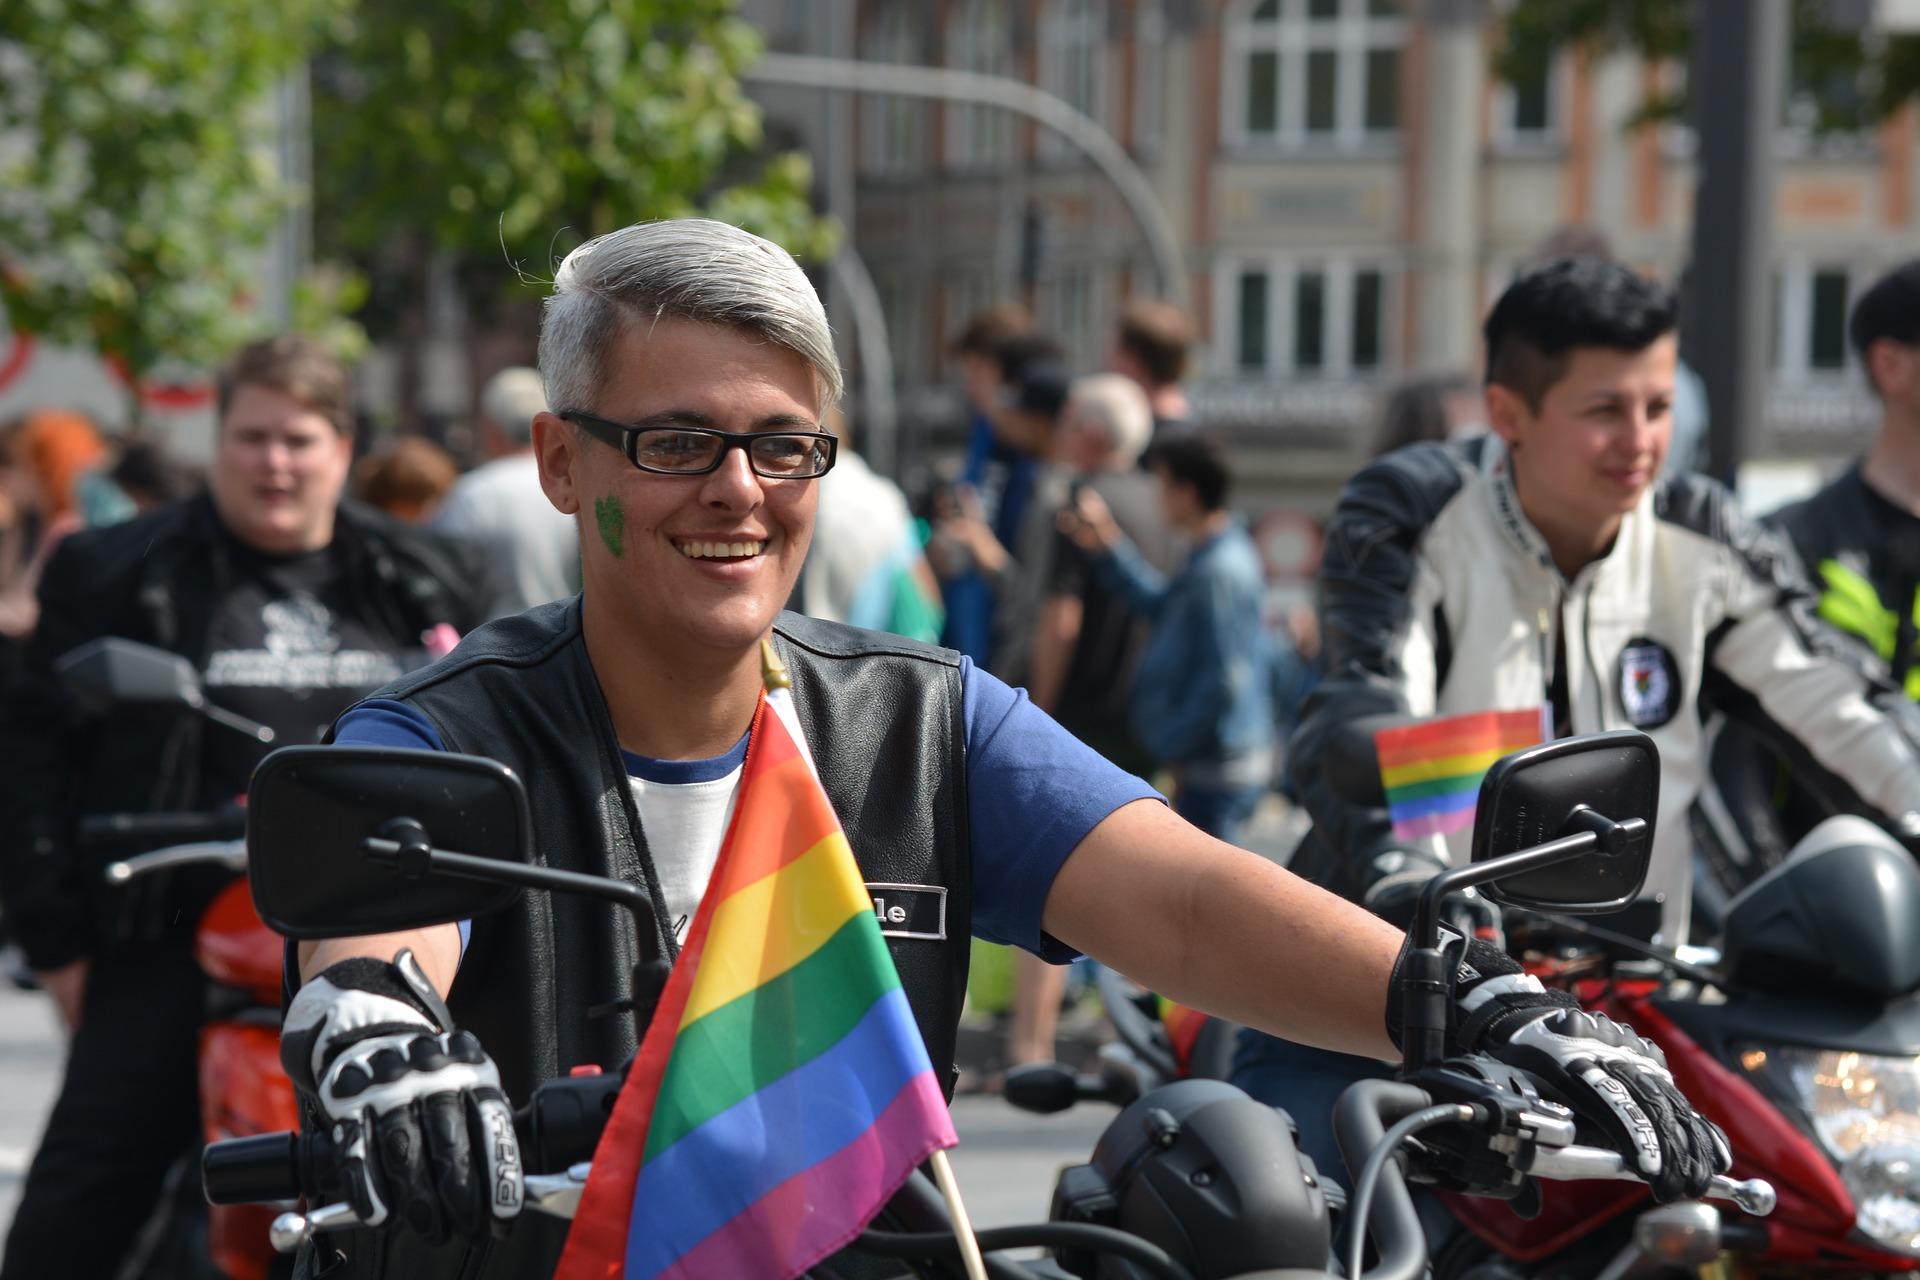 Seattle Pride Events